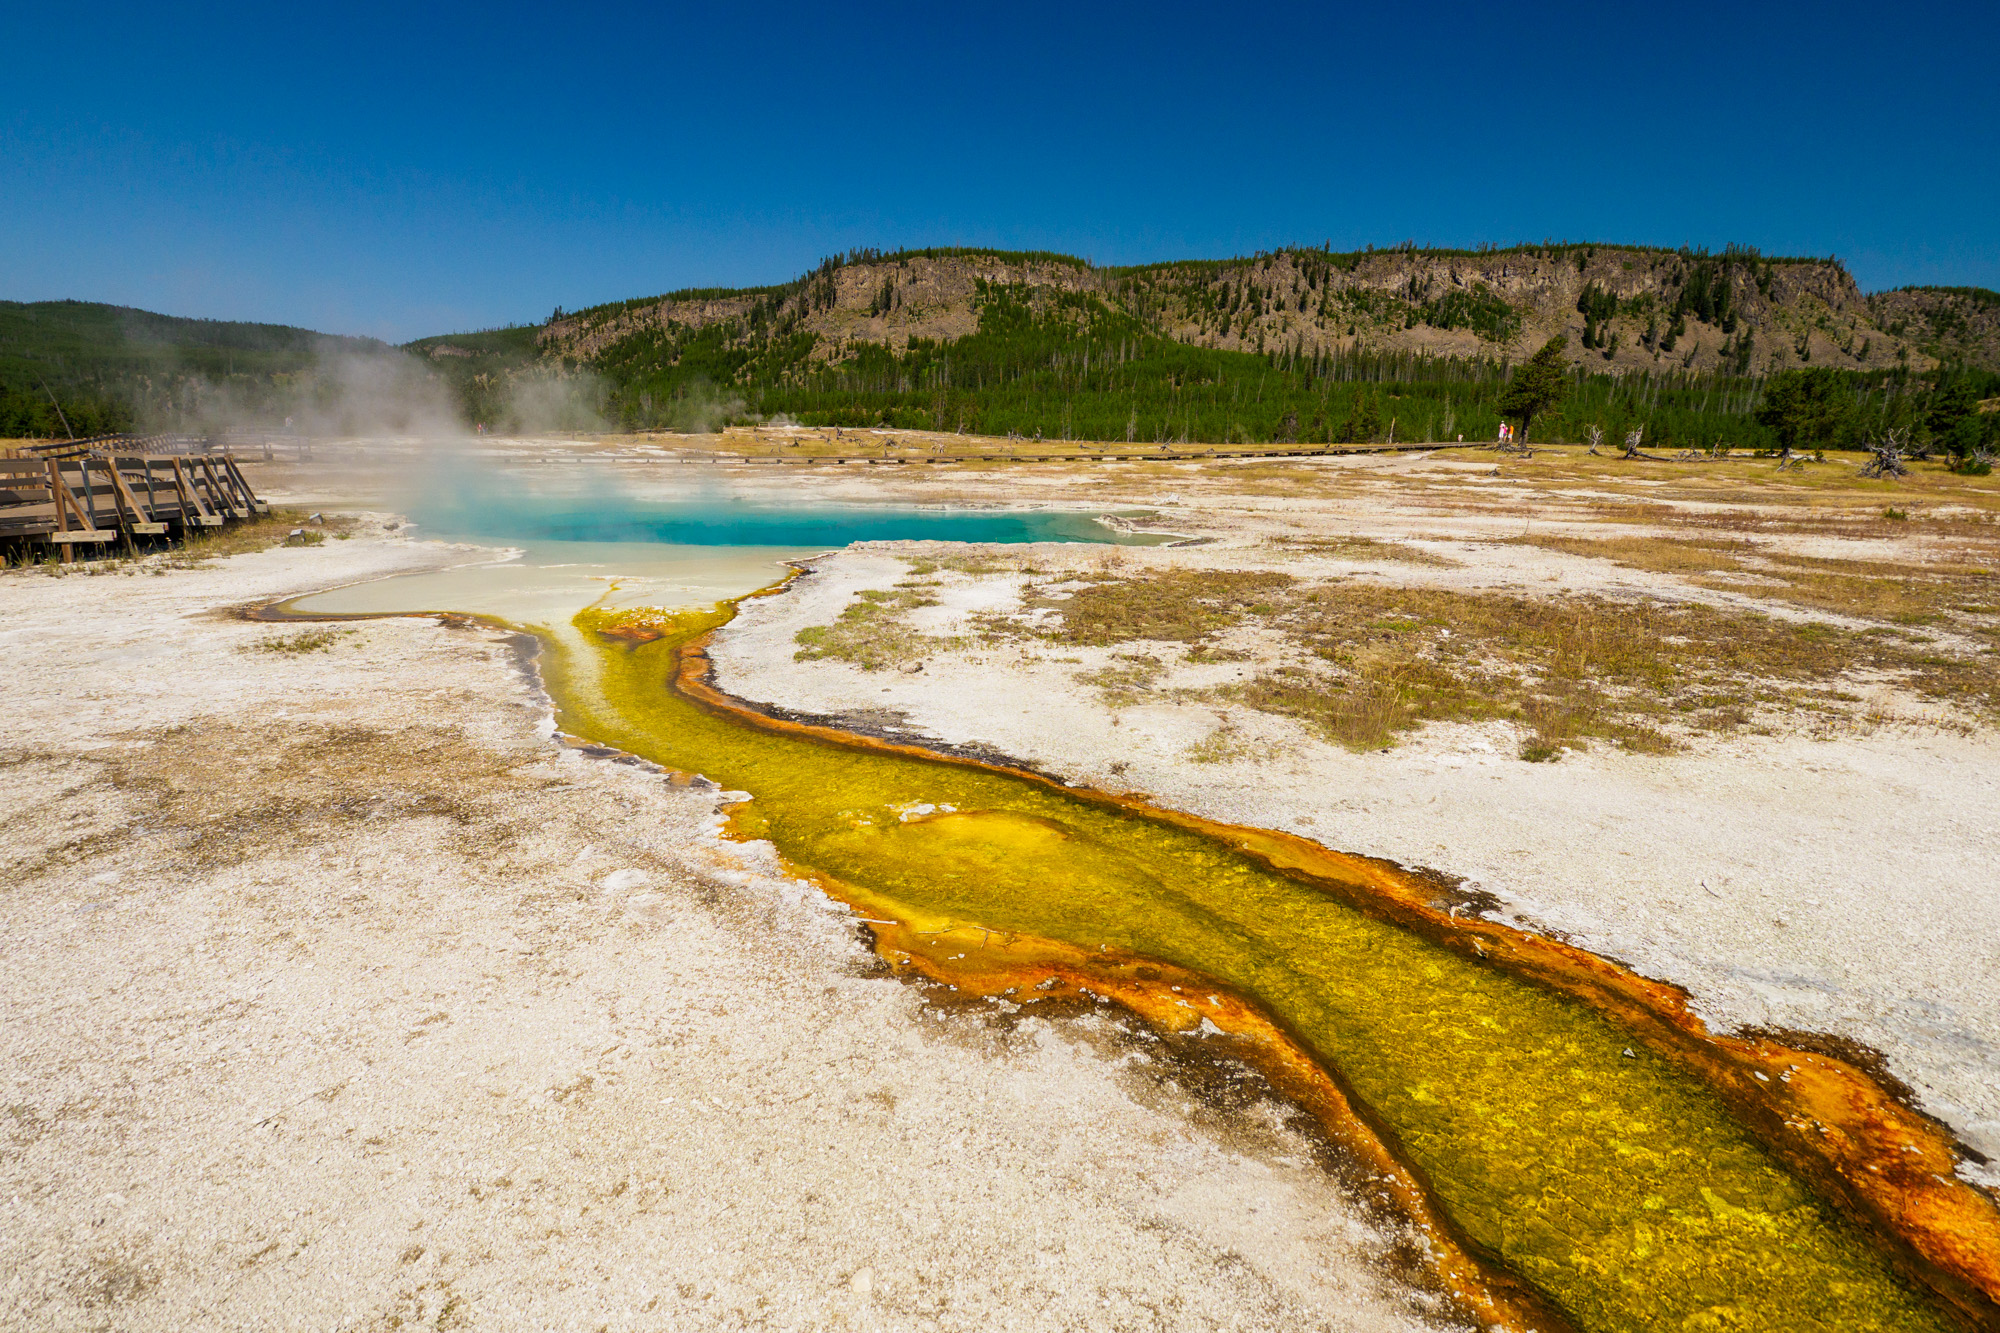 Yellowstone Nationalpark - Saphire Pool im Biscuit Basin